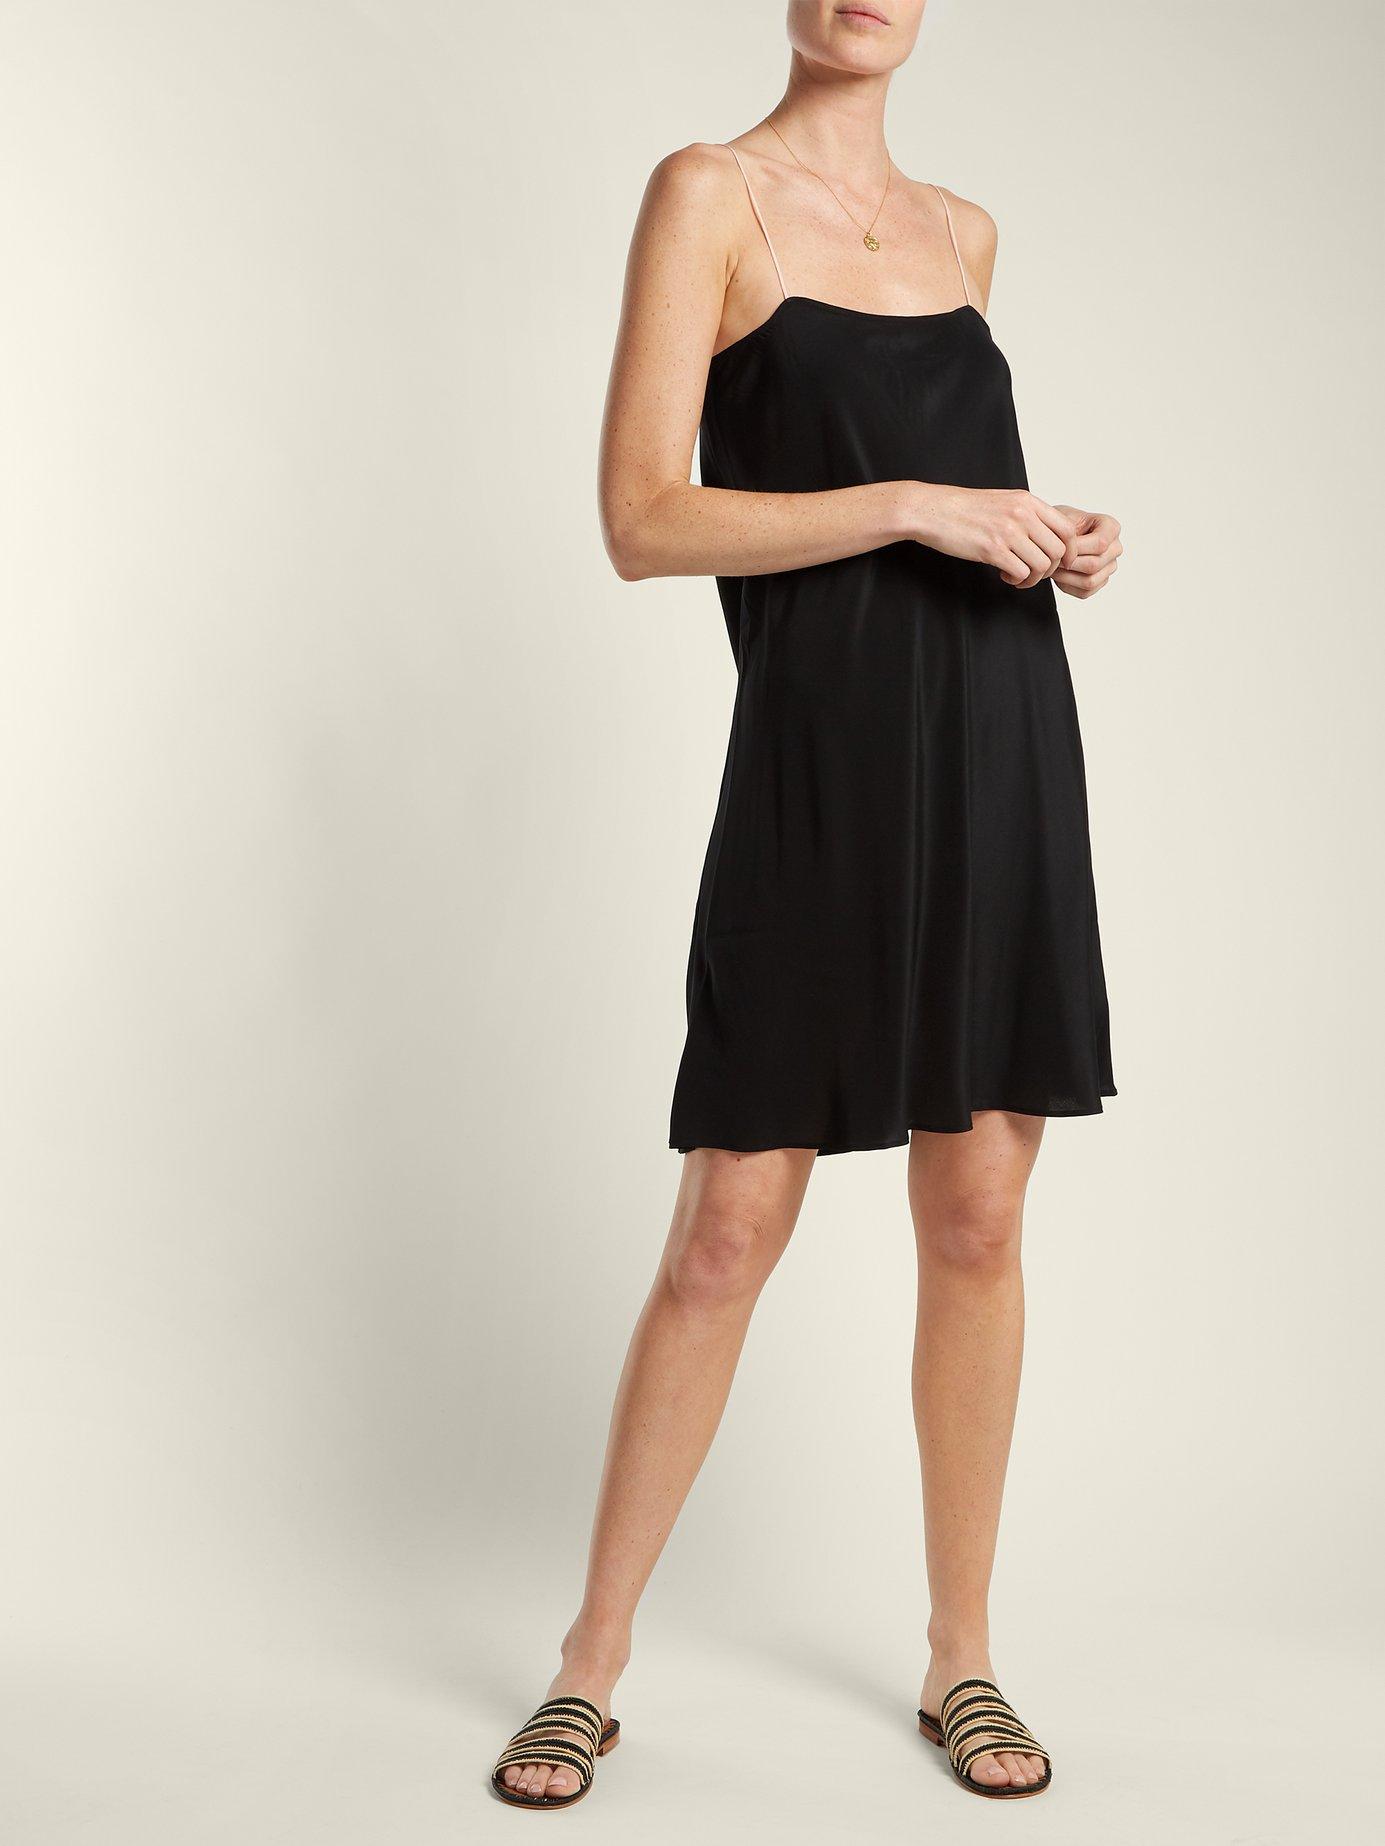 Silk slip dress by Loup Charmant